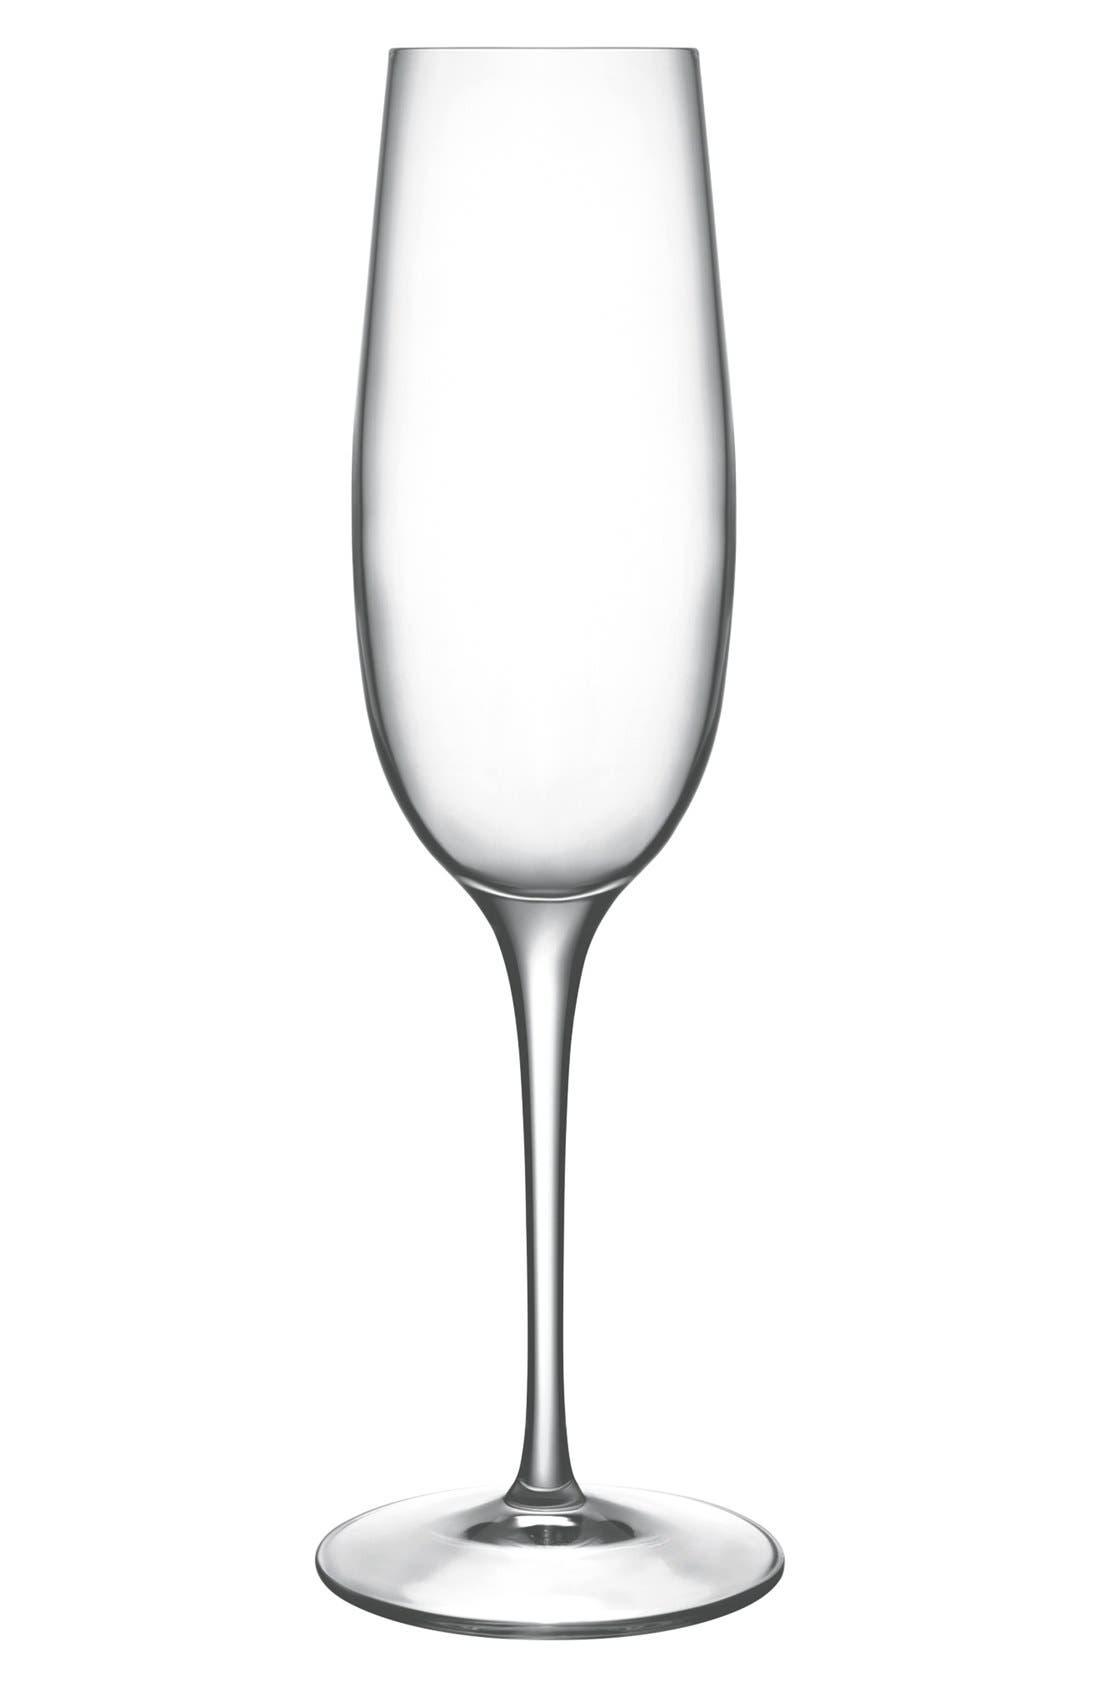 Alternate Image 1 Selected - Luigi Bormioli 'Crescendo' Champagne Flutes (Set of 4)